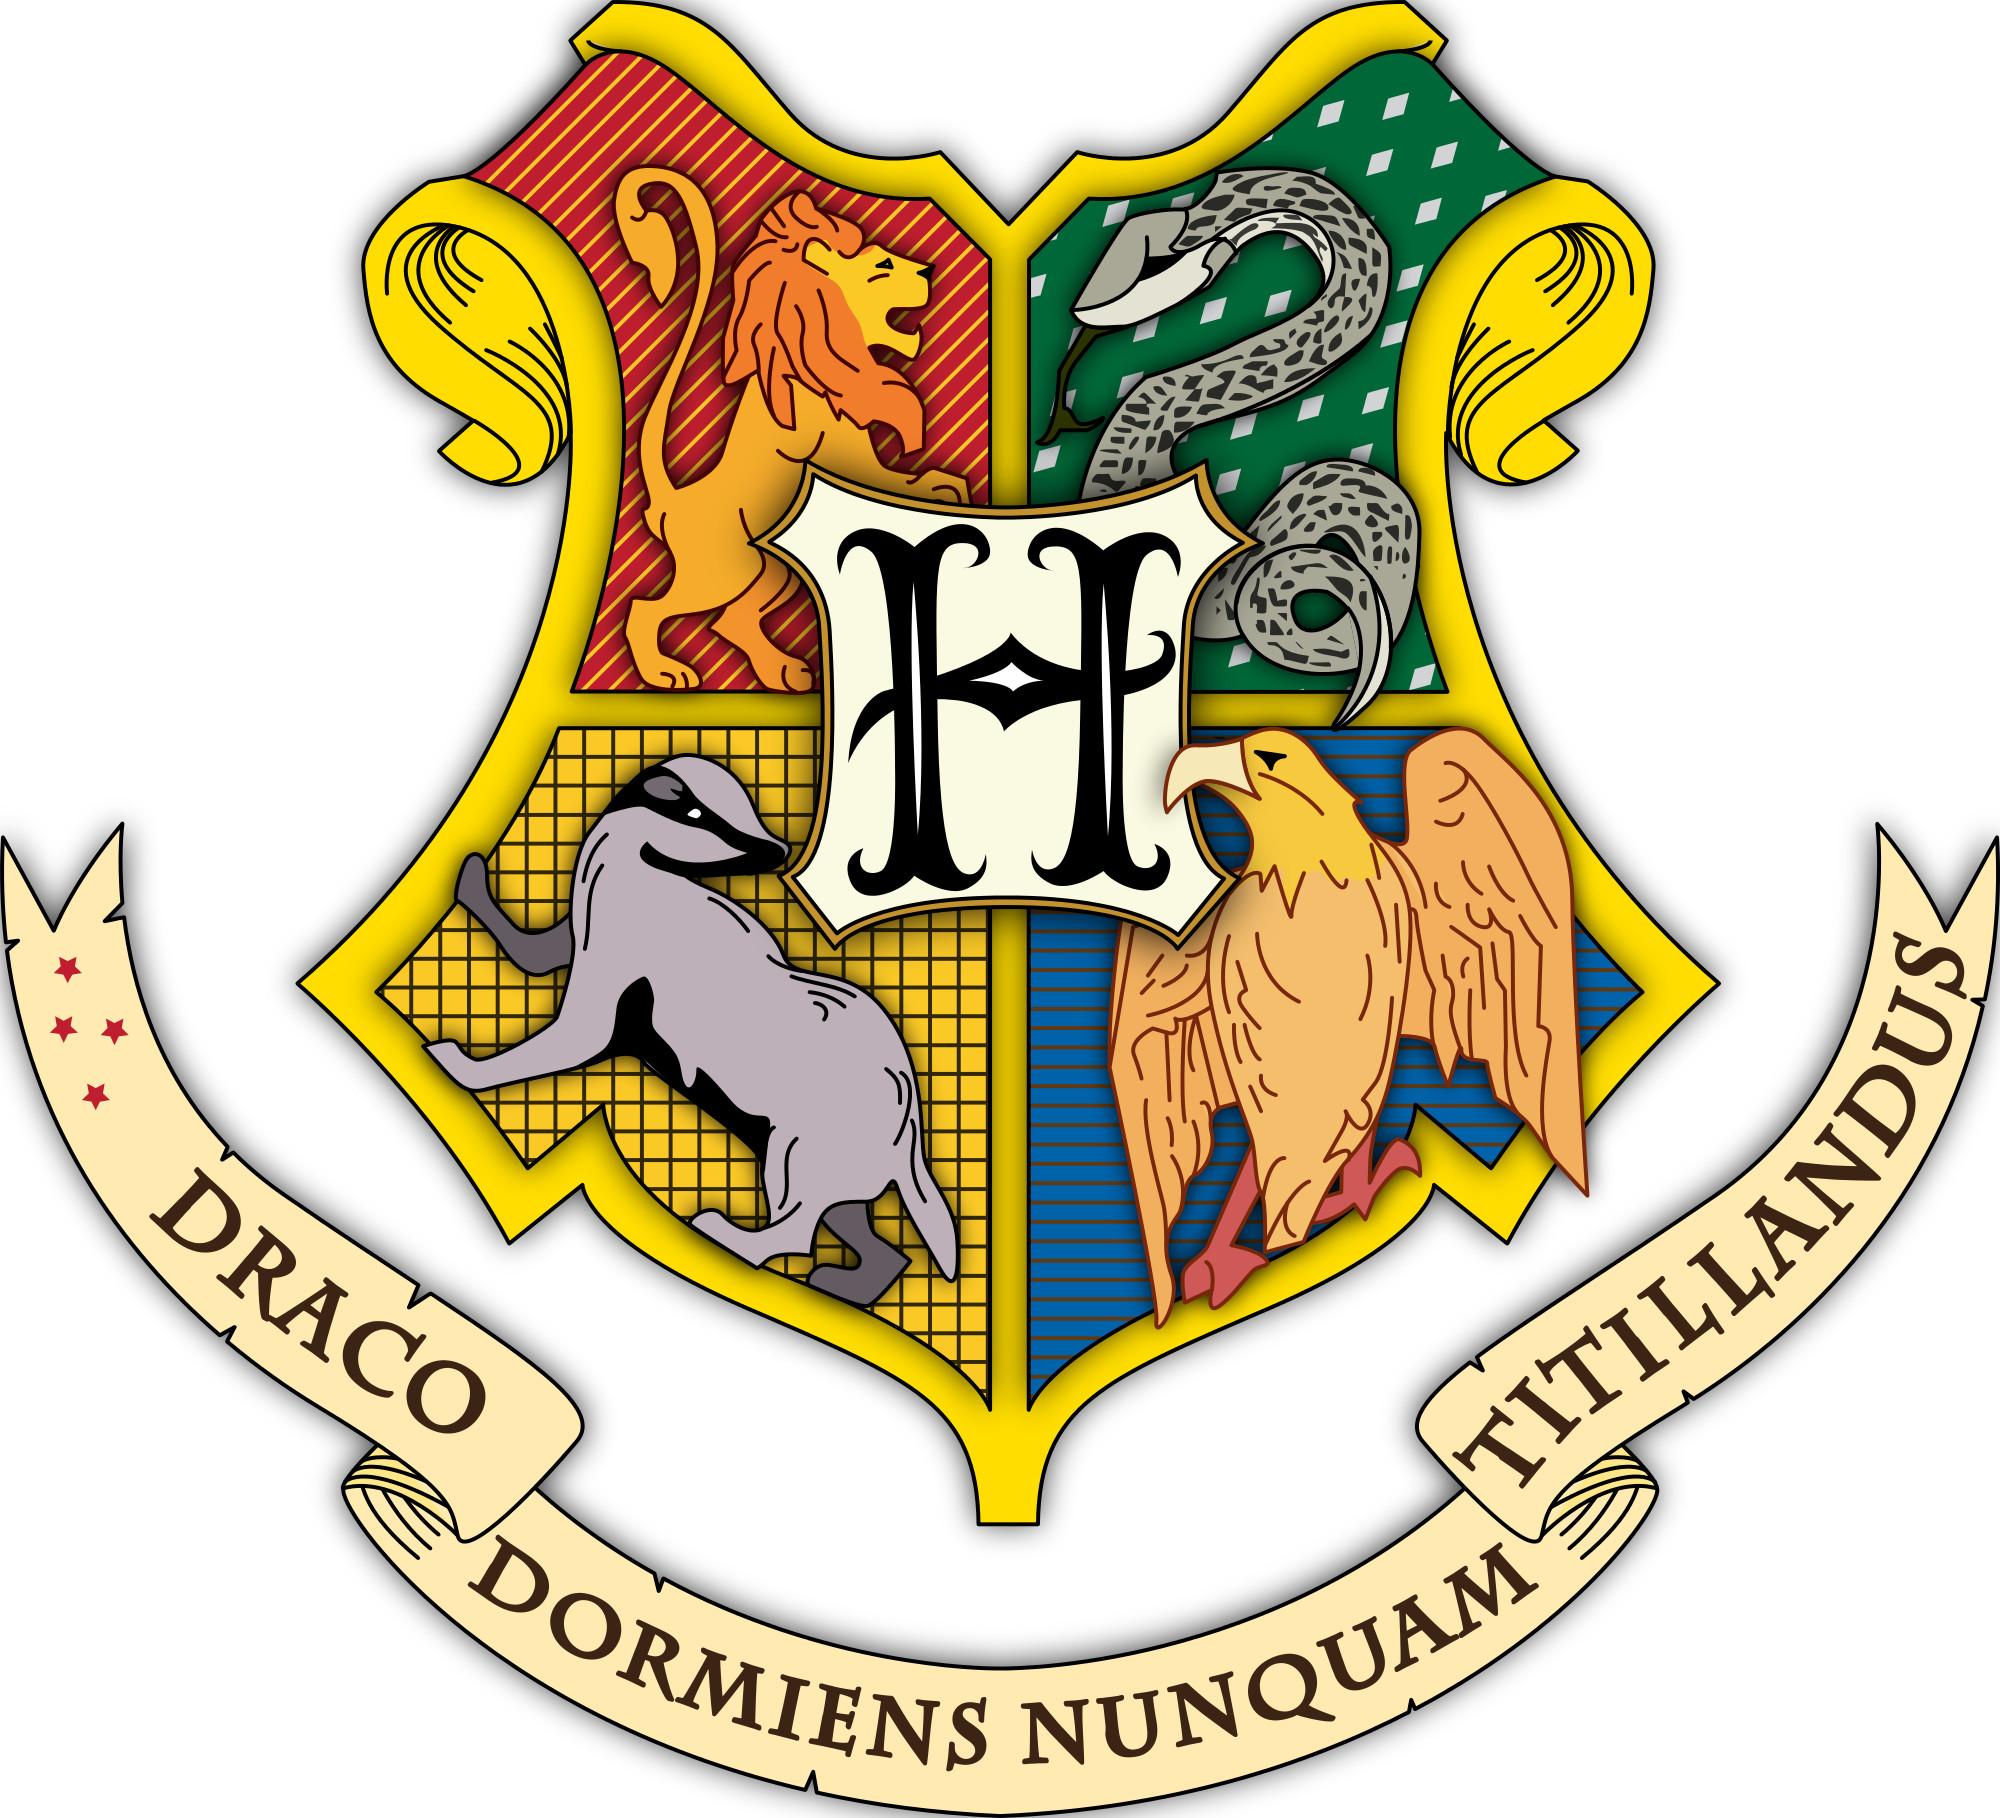 1920x1080 Harry Potter Wallpaper Hogwarts   Wallpaper